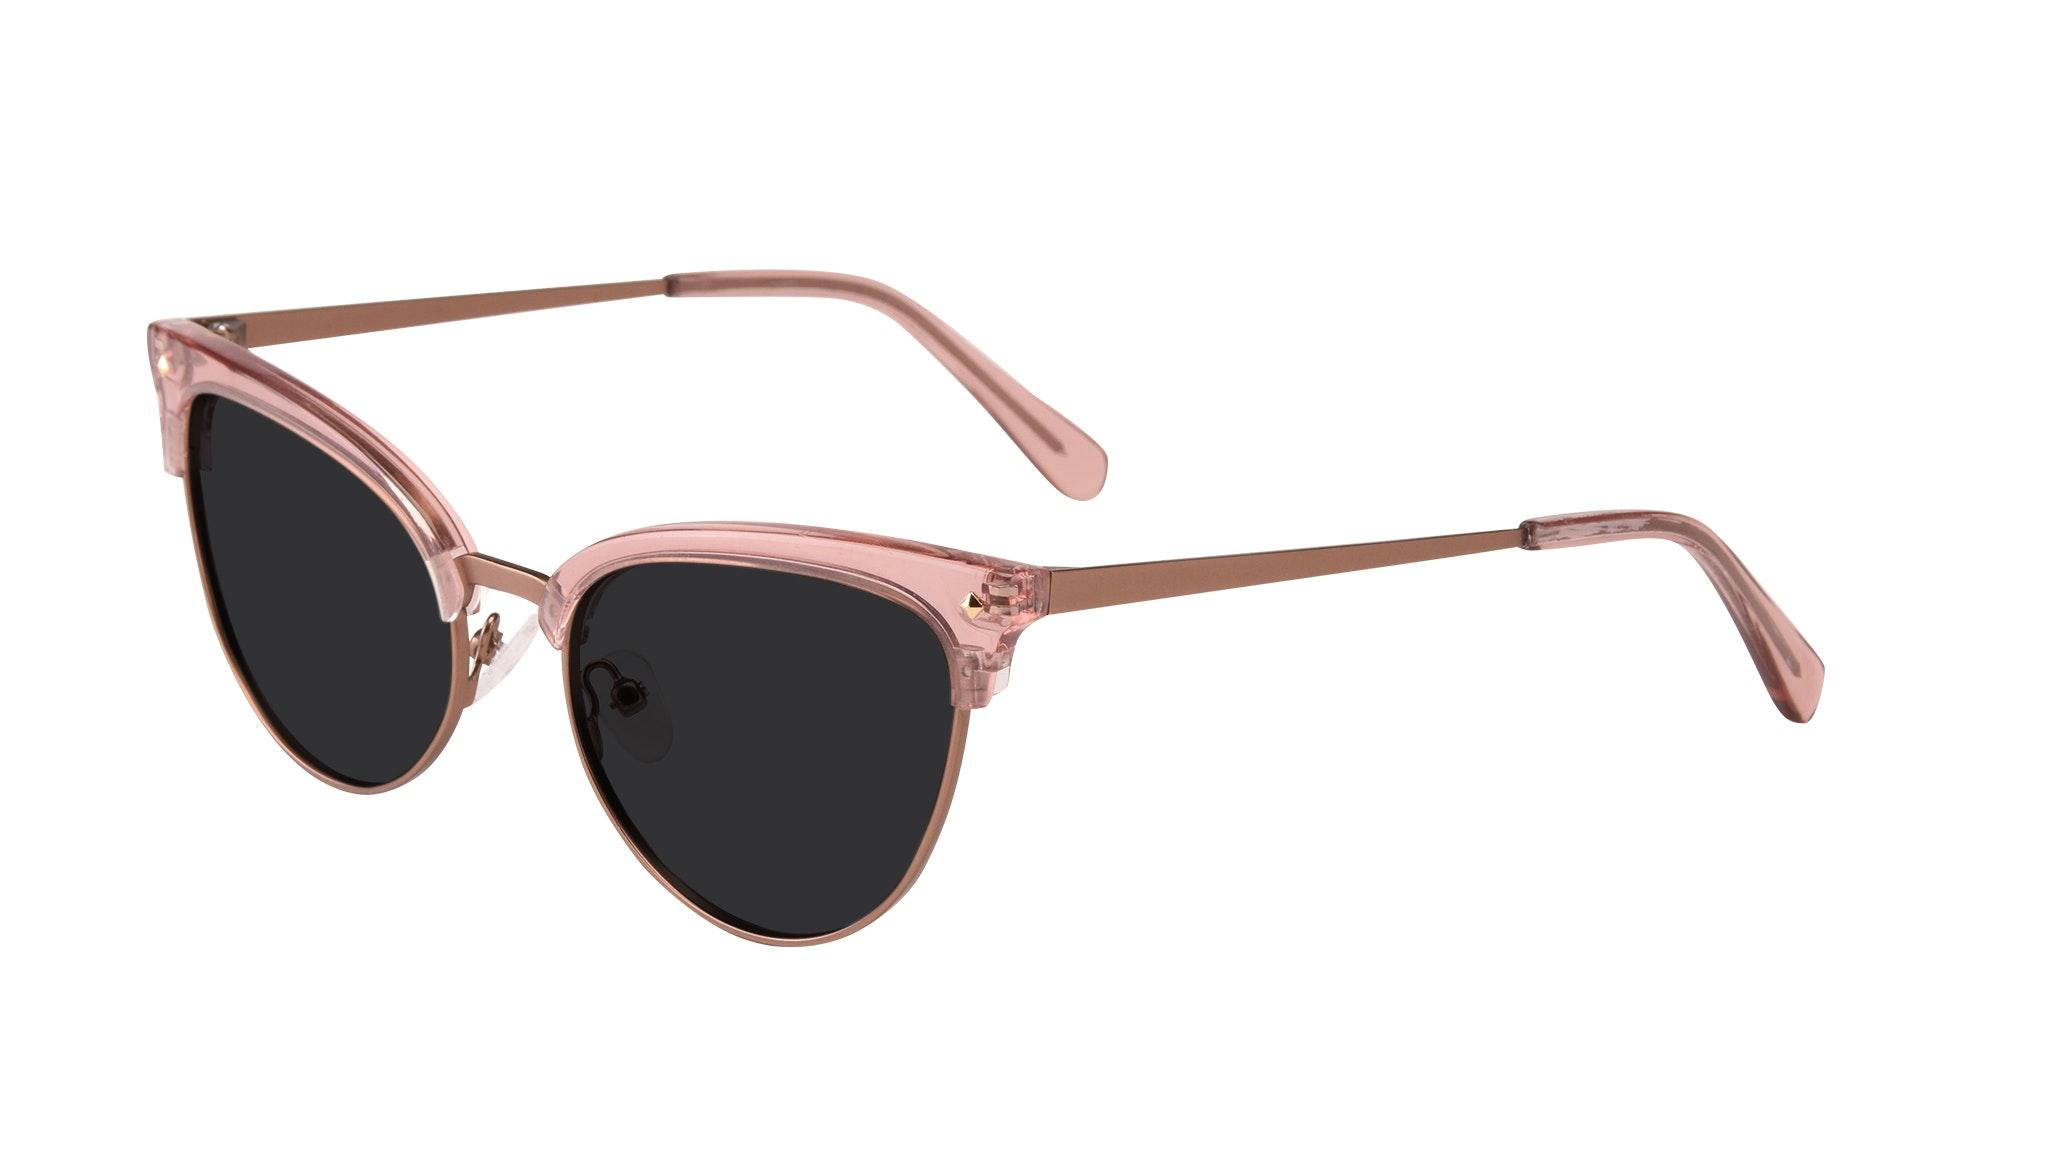 Affordable Fashion Glasses Cat Eye Daring Cateye Sunglasses Women Moon Rose Tilt